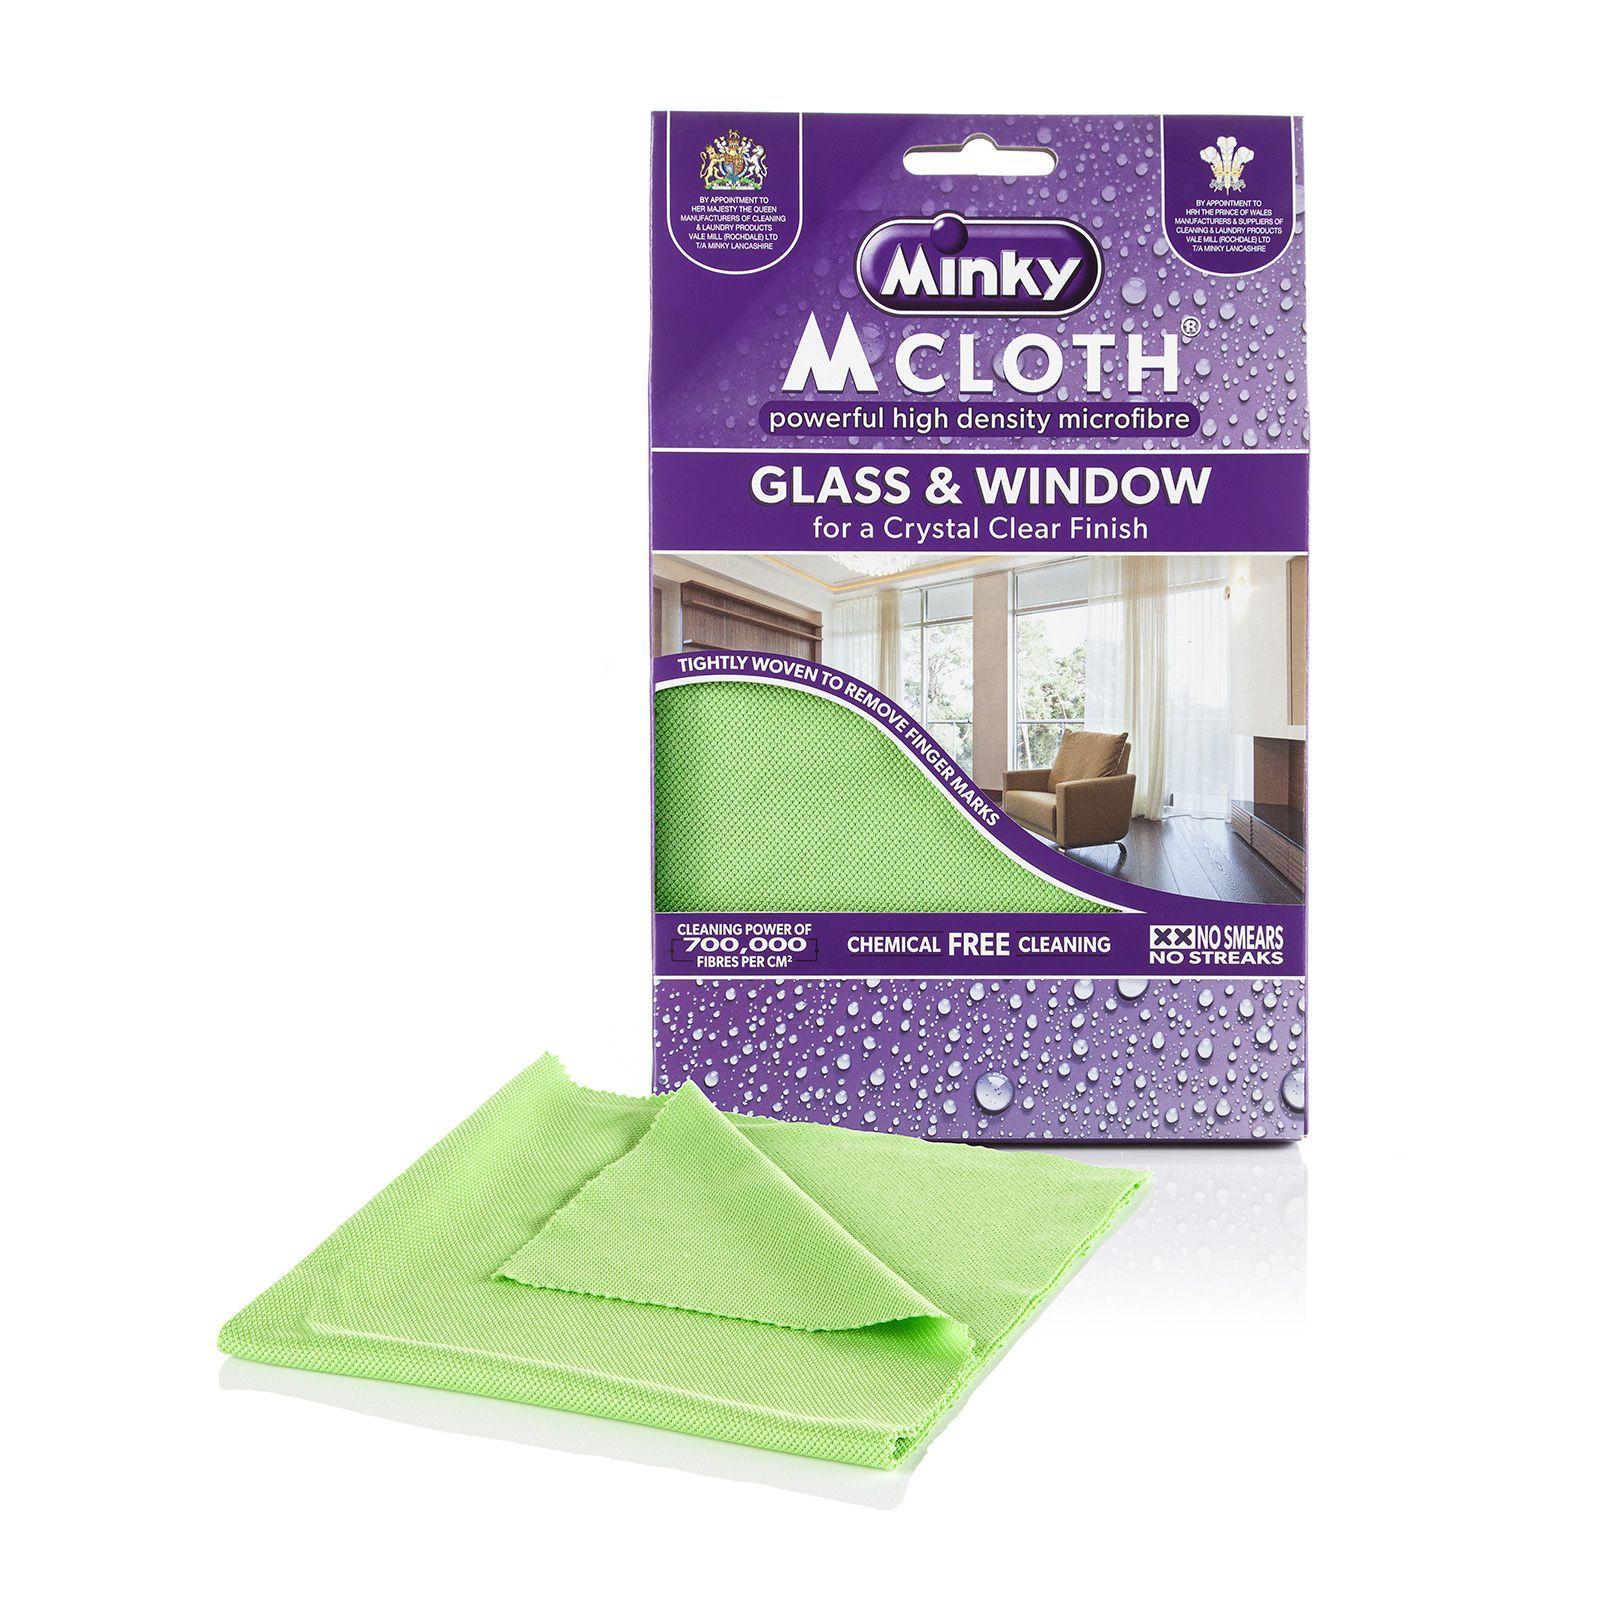 minky m cloth glass and window